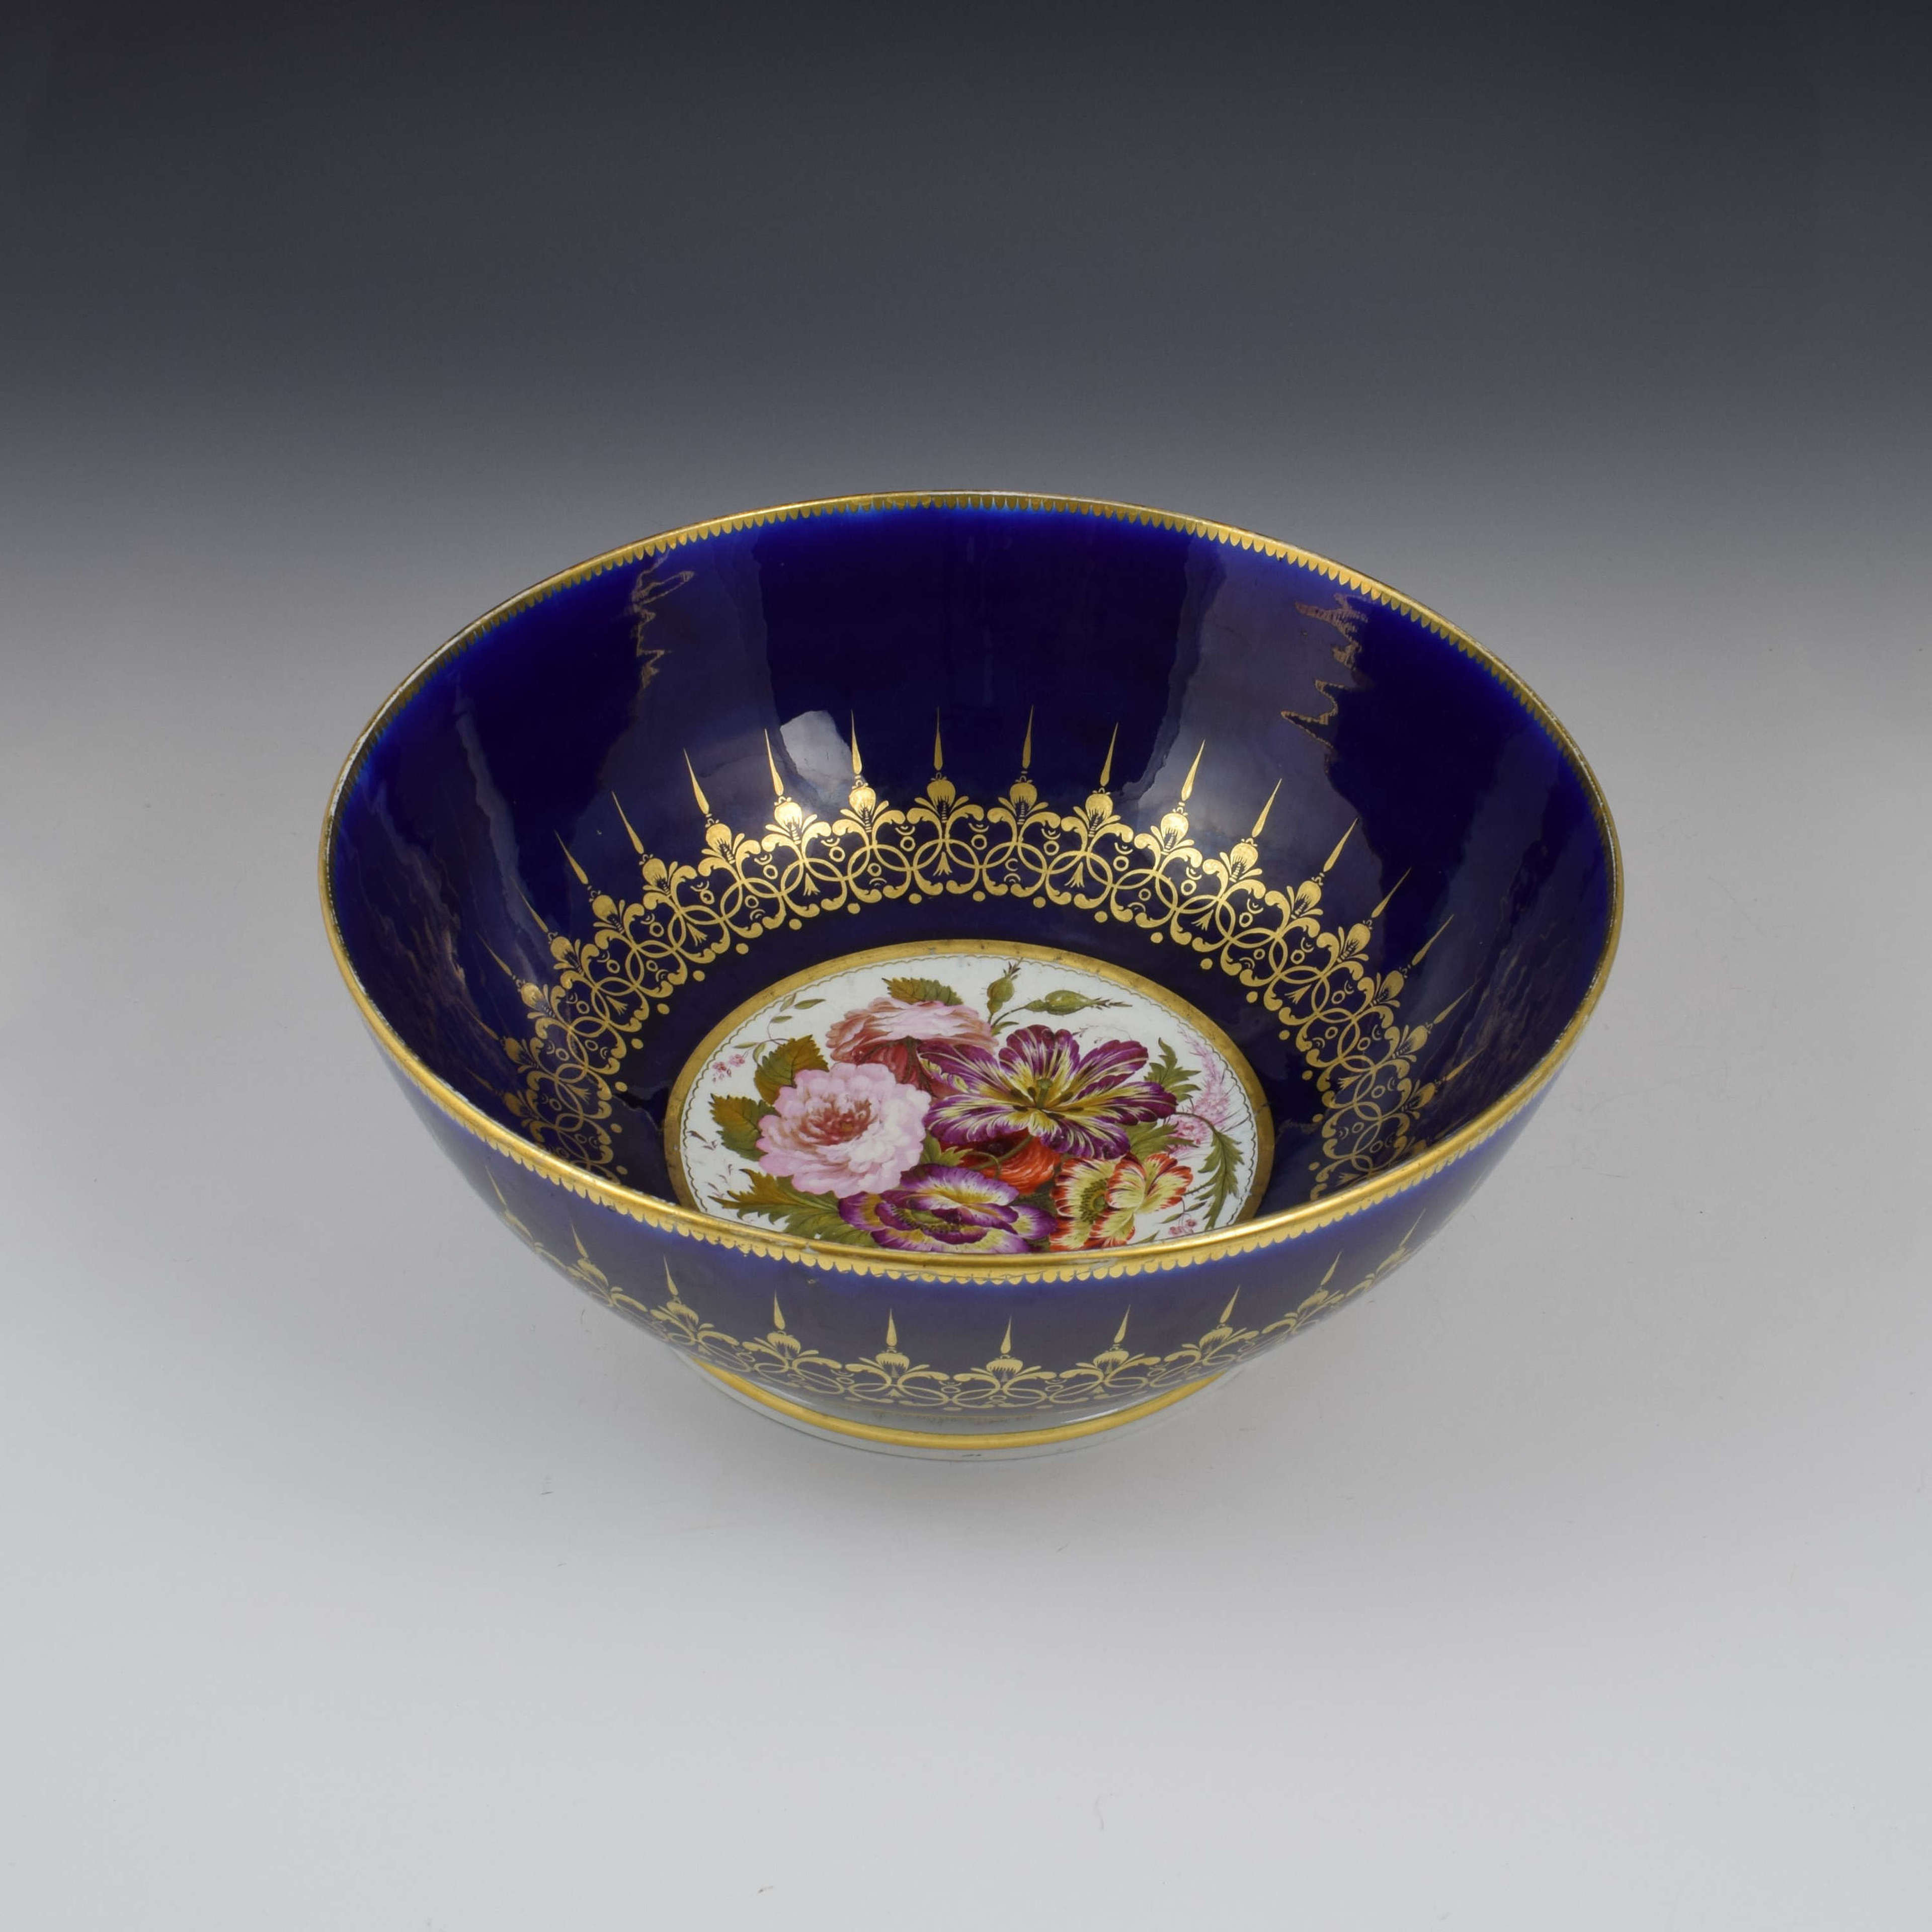 Large Chamberlain Worcester Porcelain Punch Bowl c.1816-1820